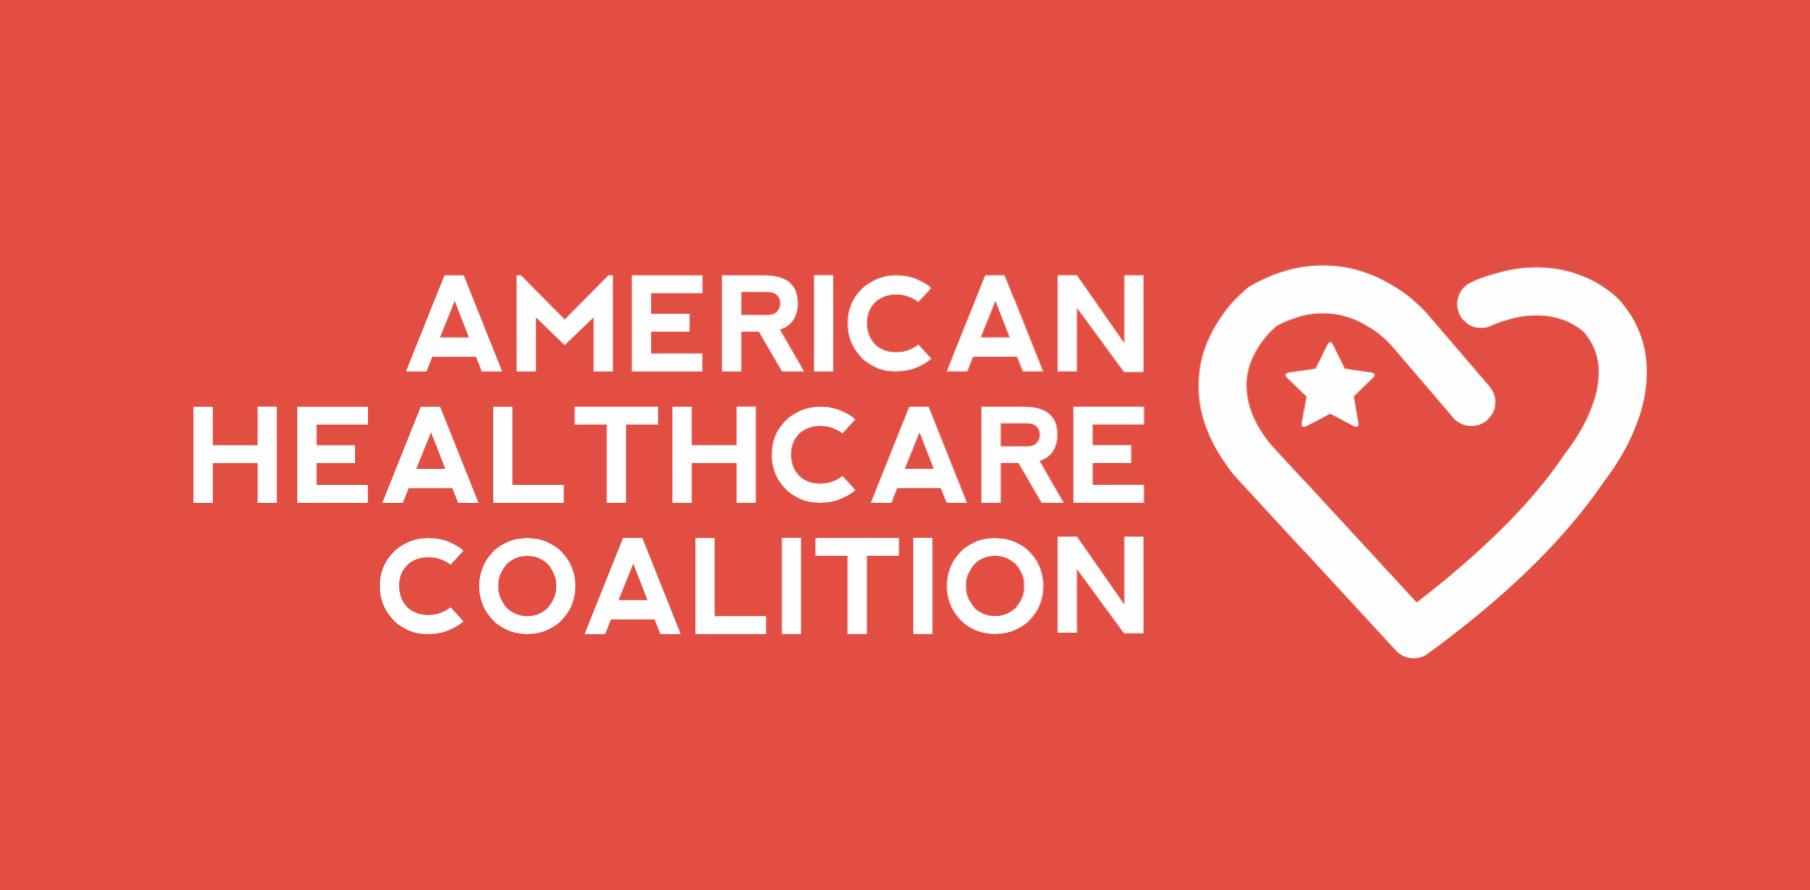 American Healthcare Coalition